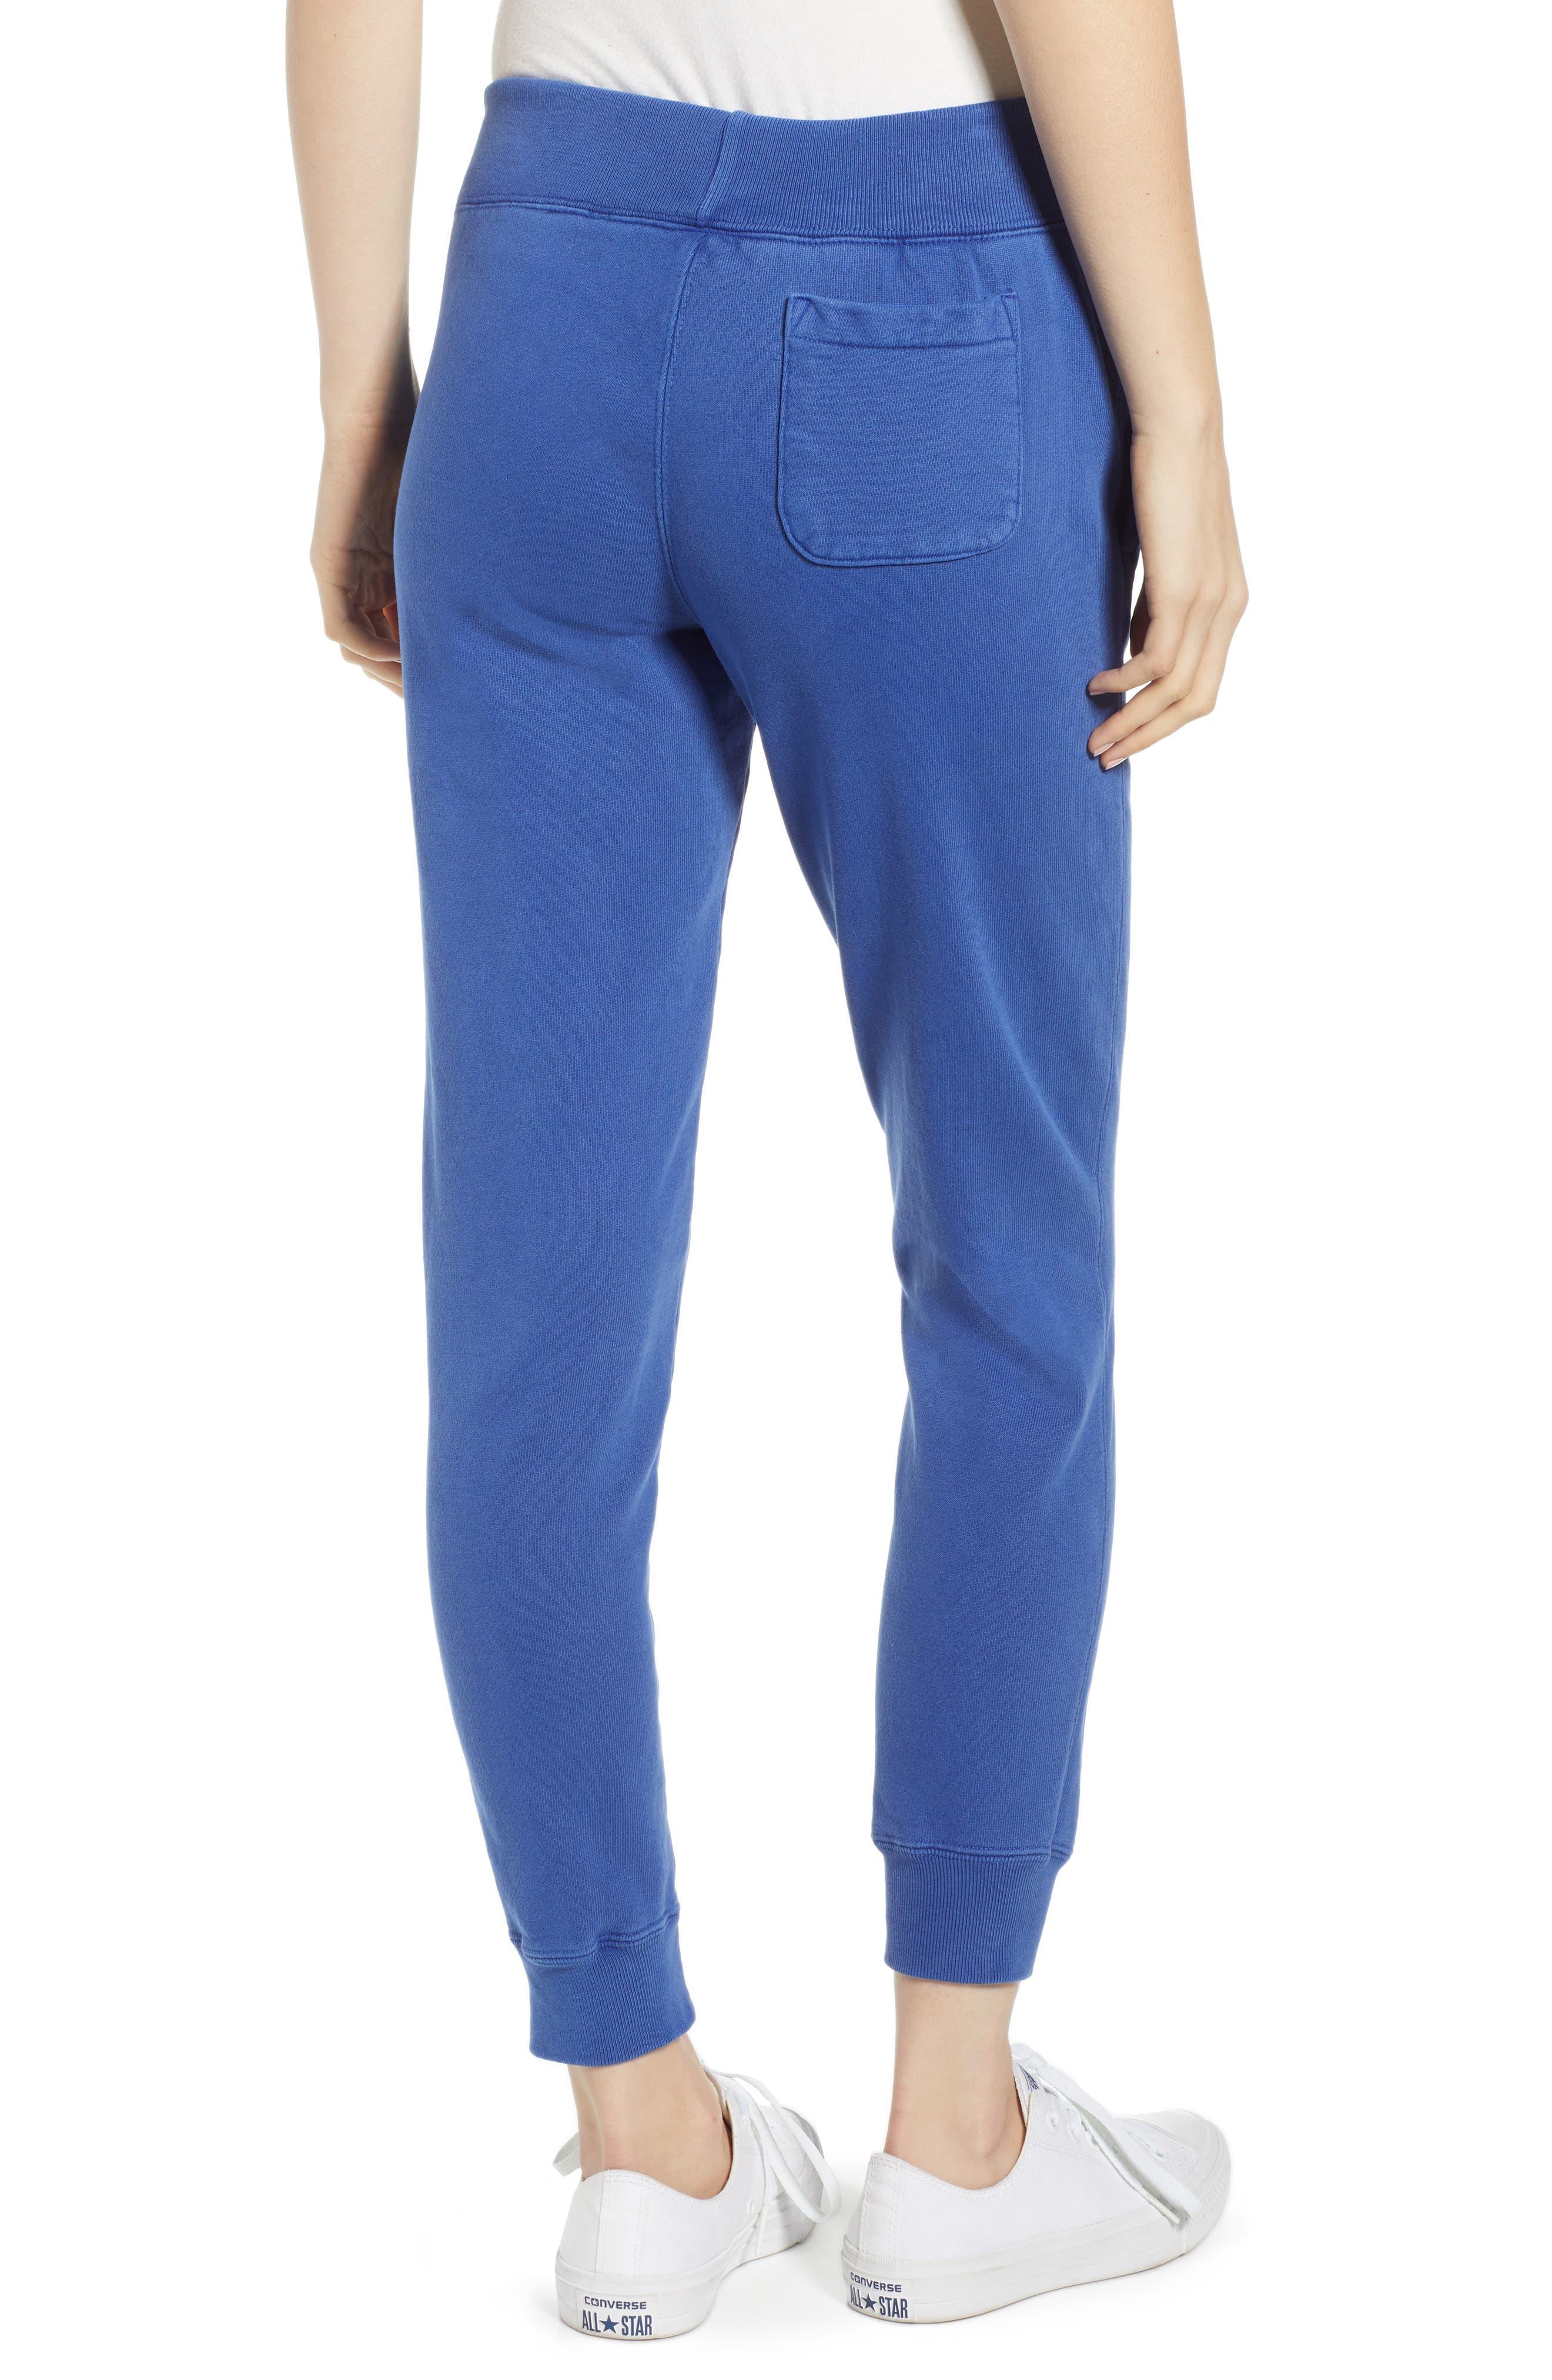 CHAMPION, Garment Dyed Jogger Pants, Alternate thumbnail 2, color, 400